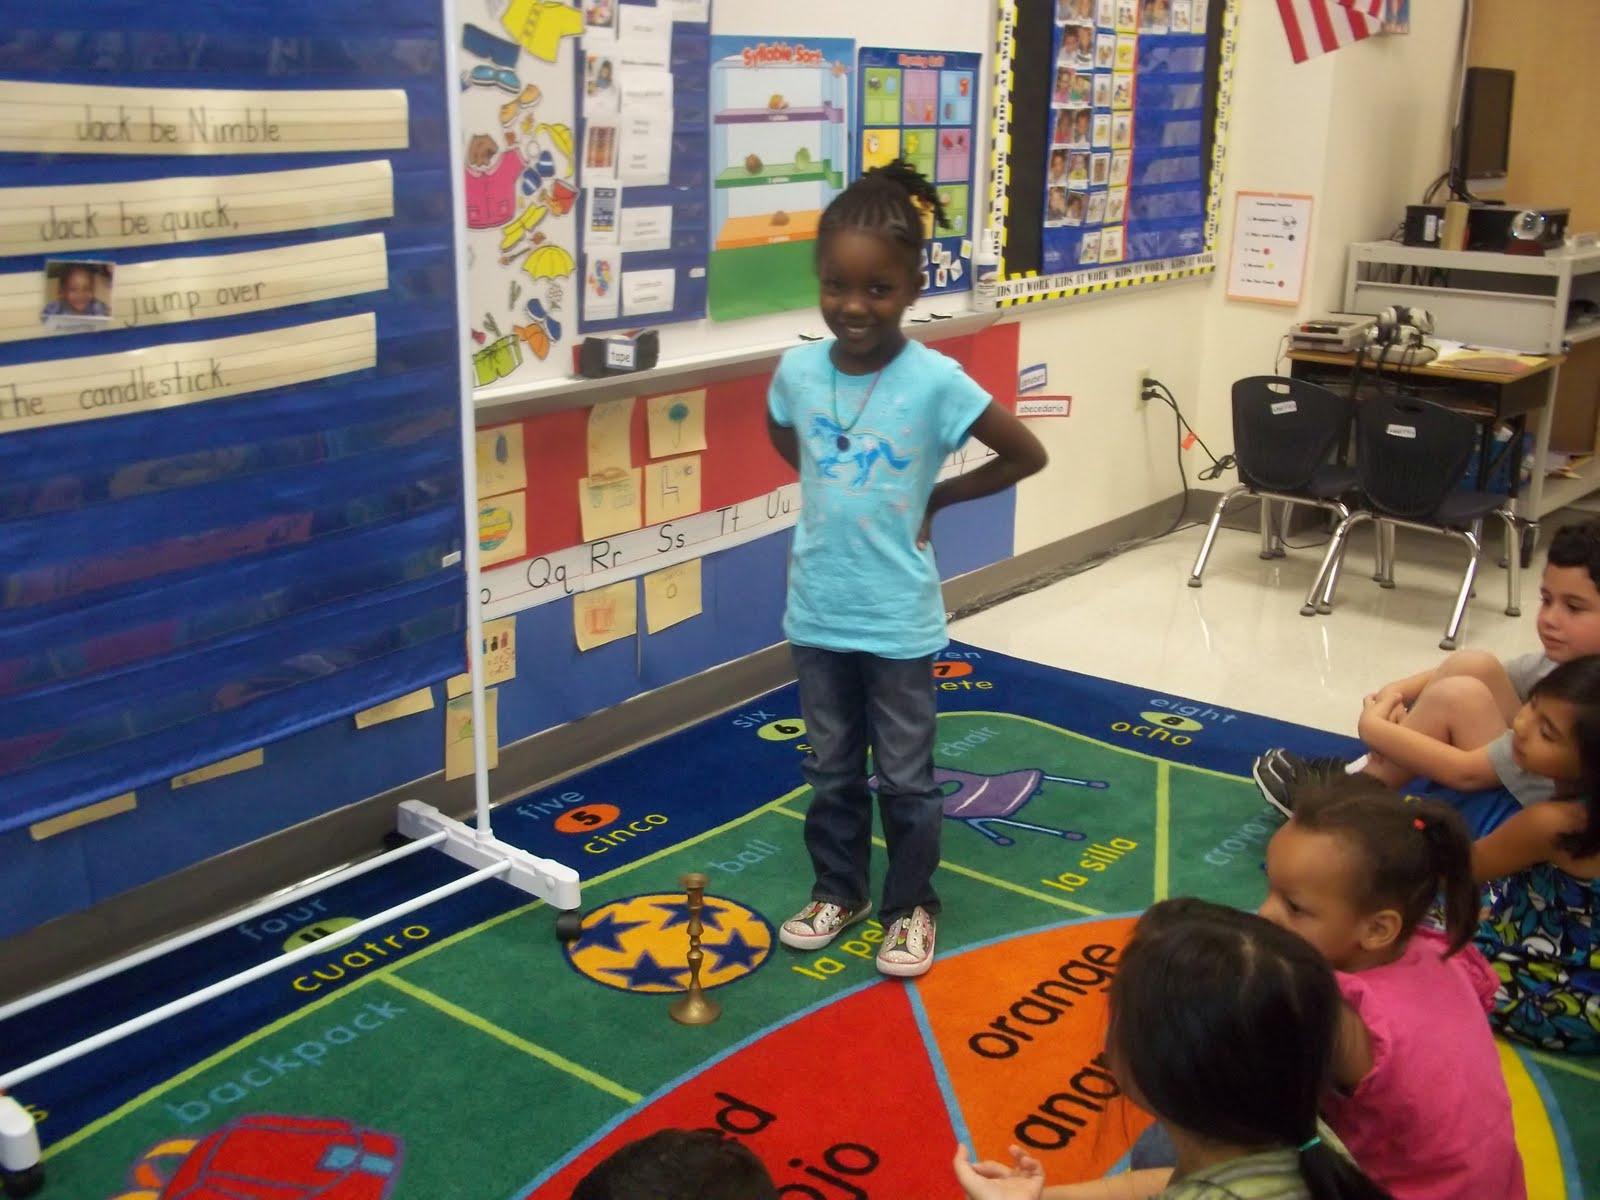 Mrs Wood S Kindergarten Class Jack Be Nimble